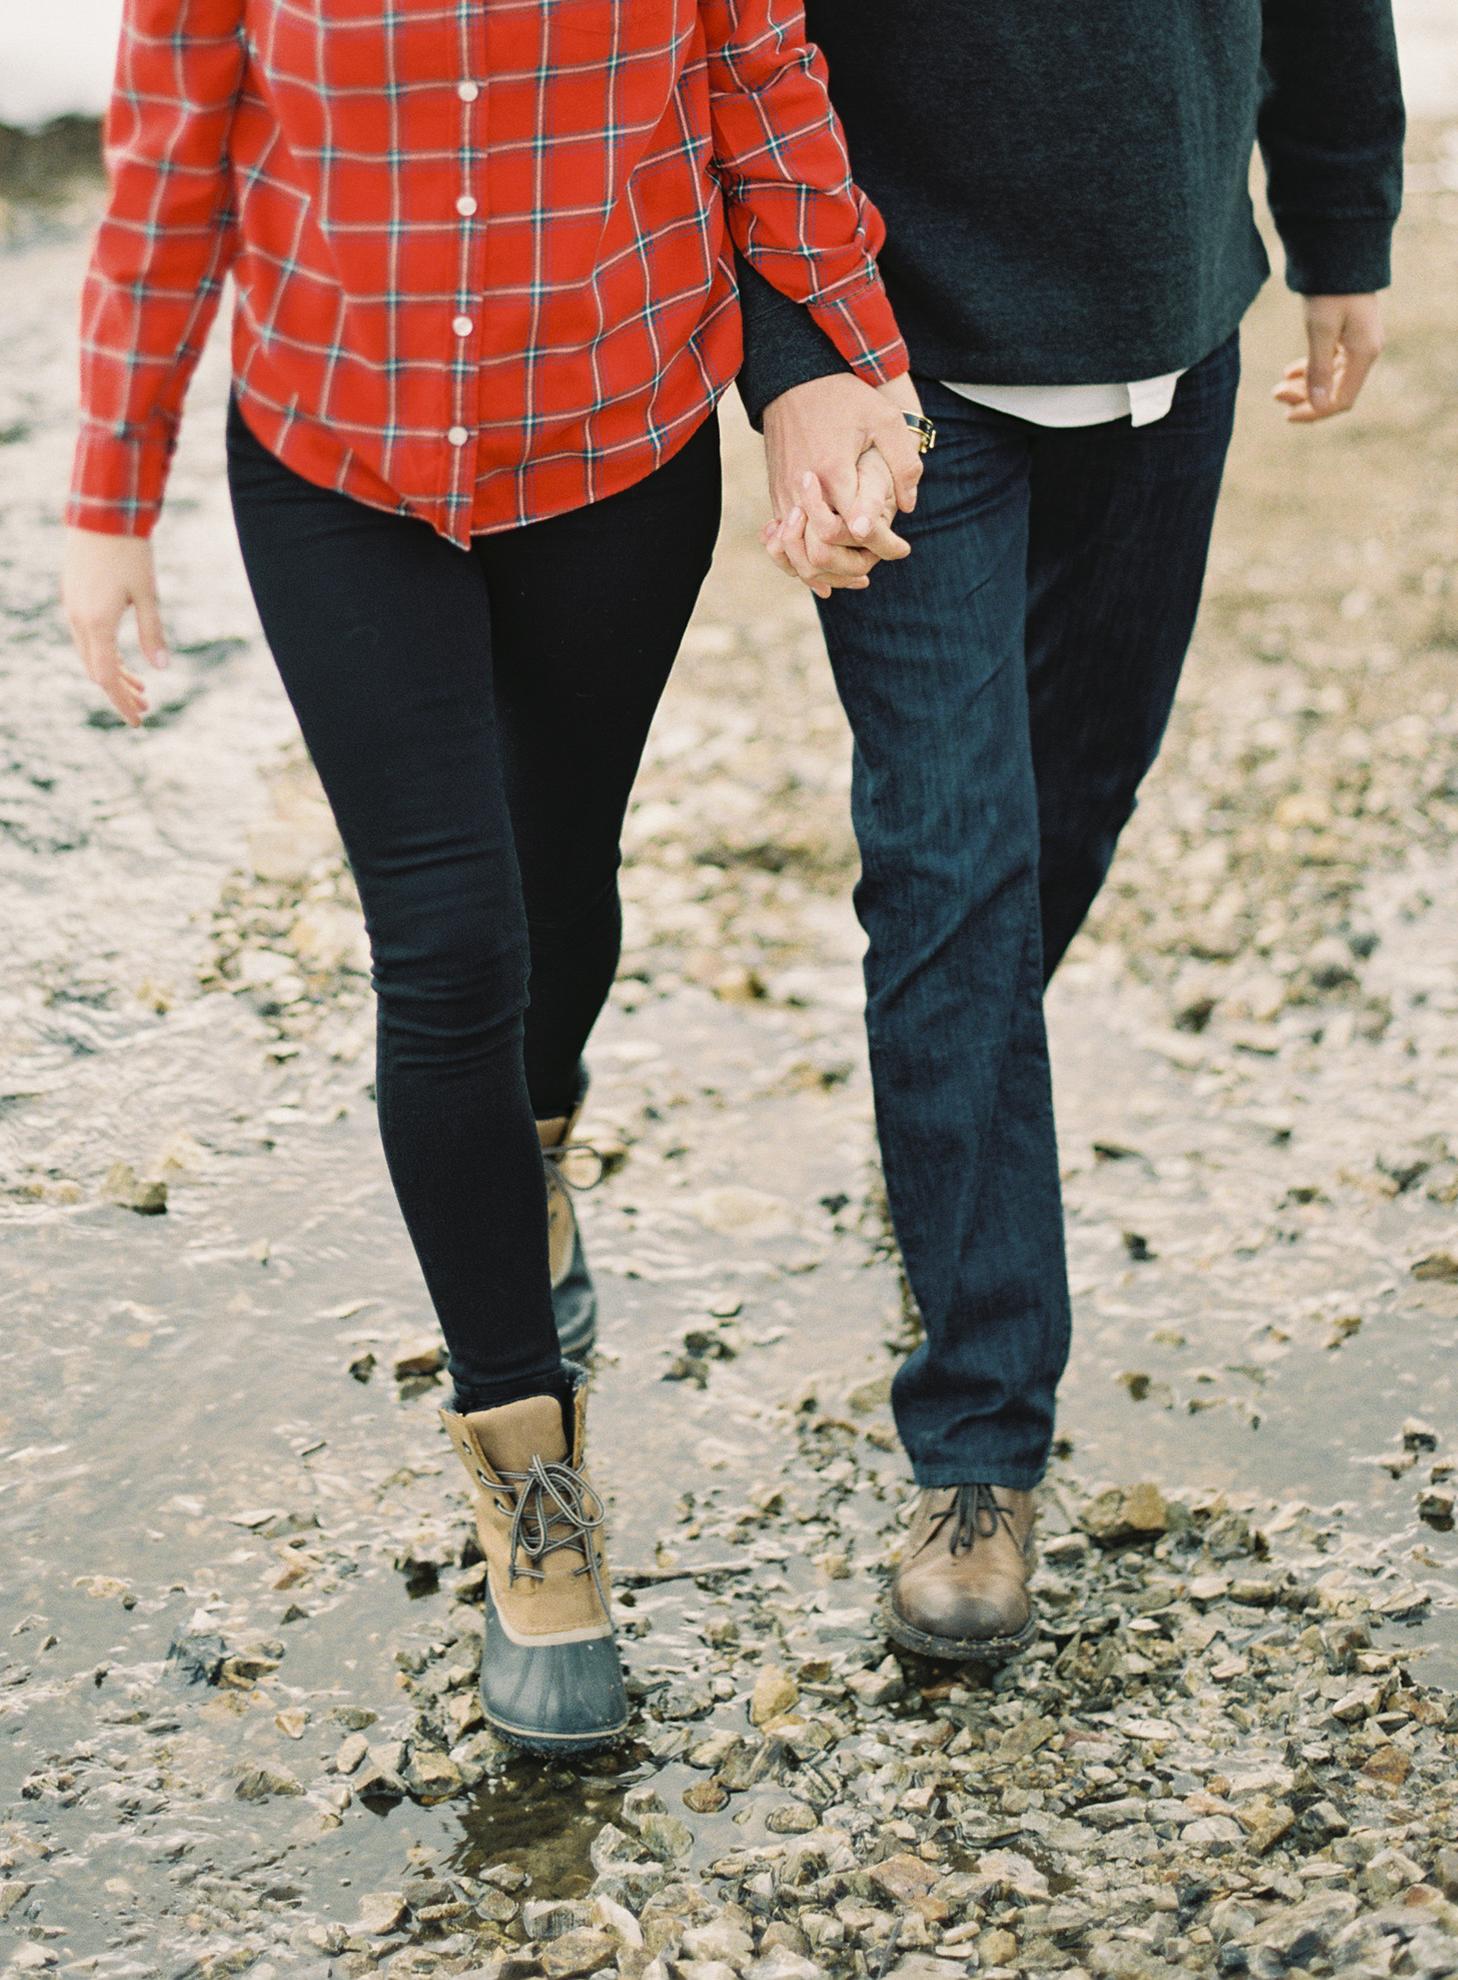 Sarah and John Engaged-Carrie King Photographer55.jpg